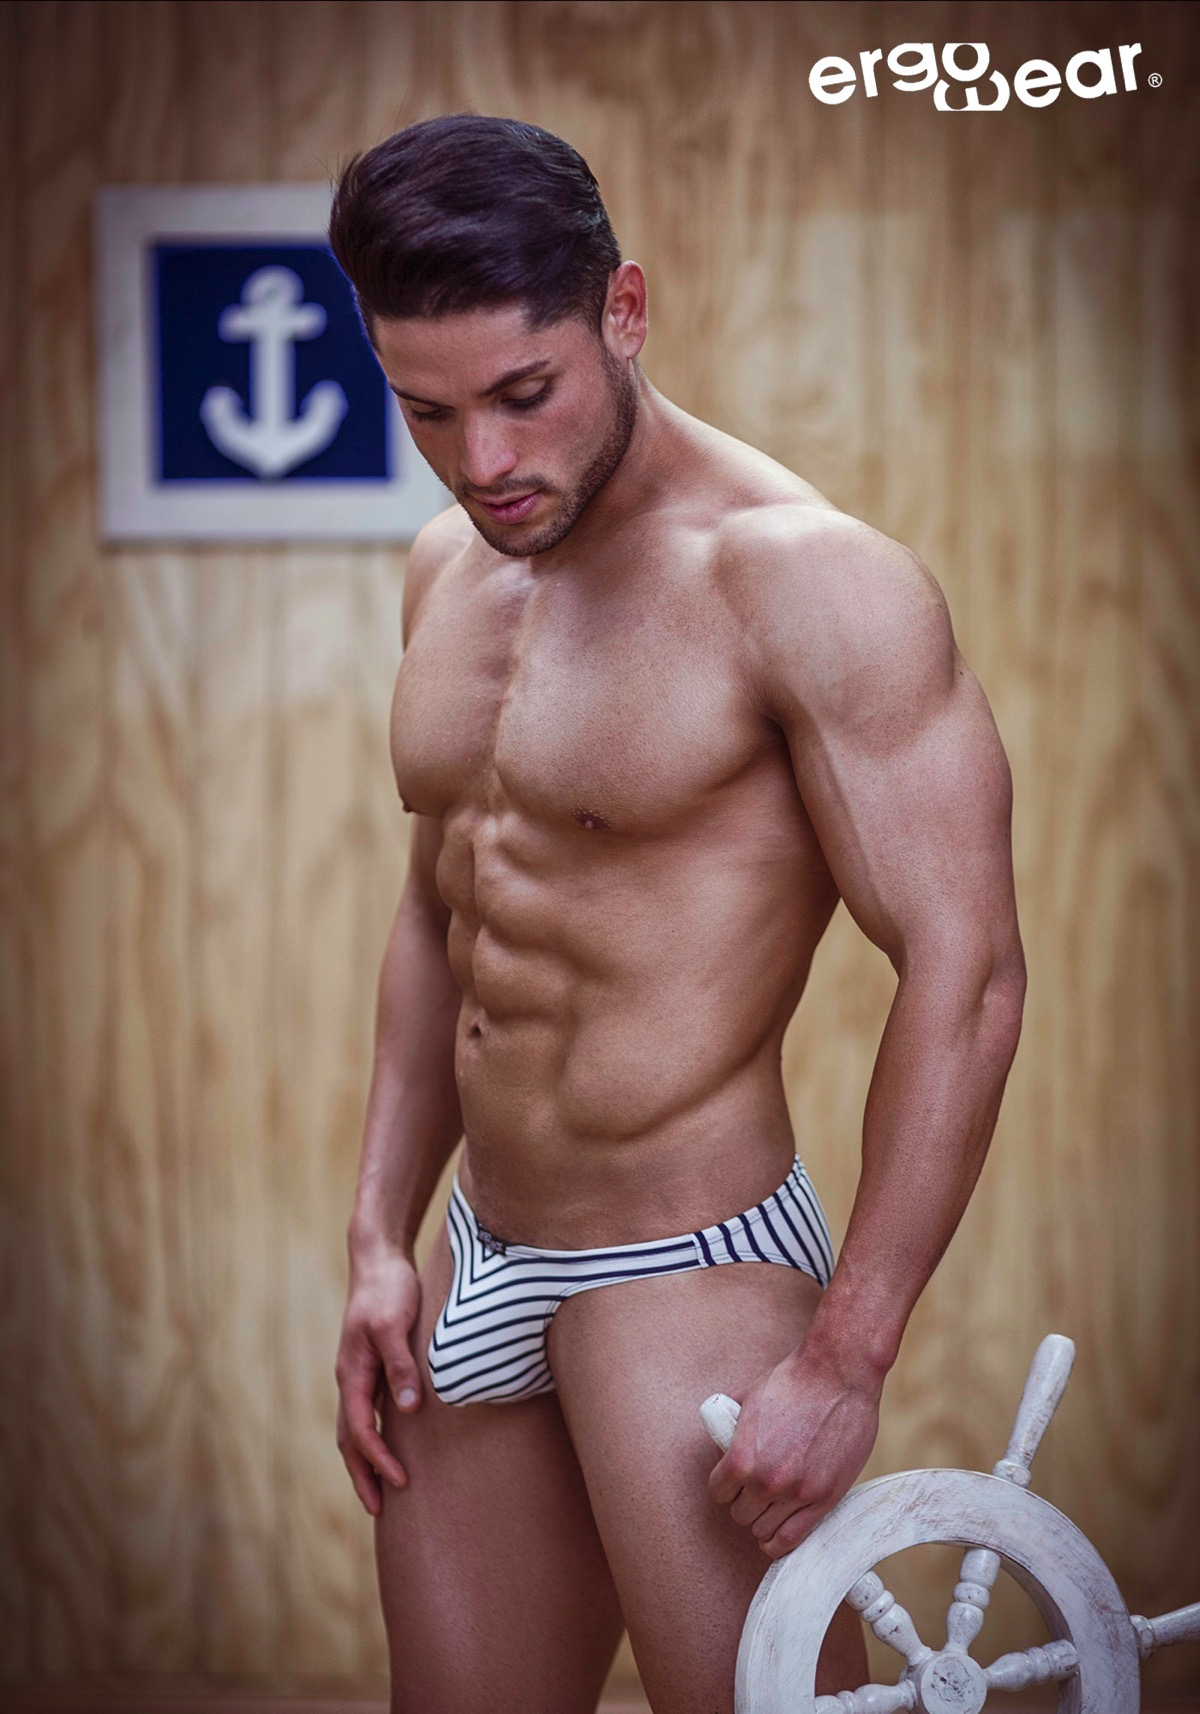 New Ergowear Limited Edition Stripes